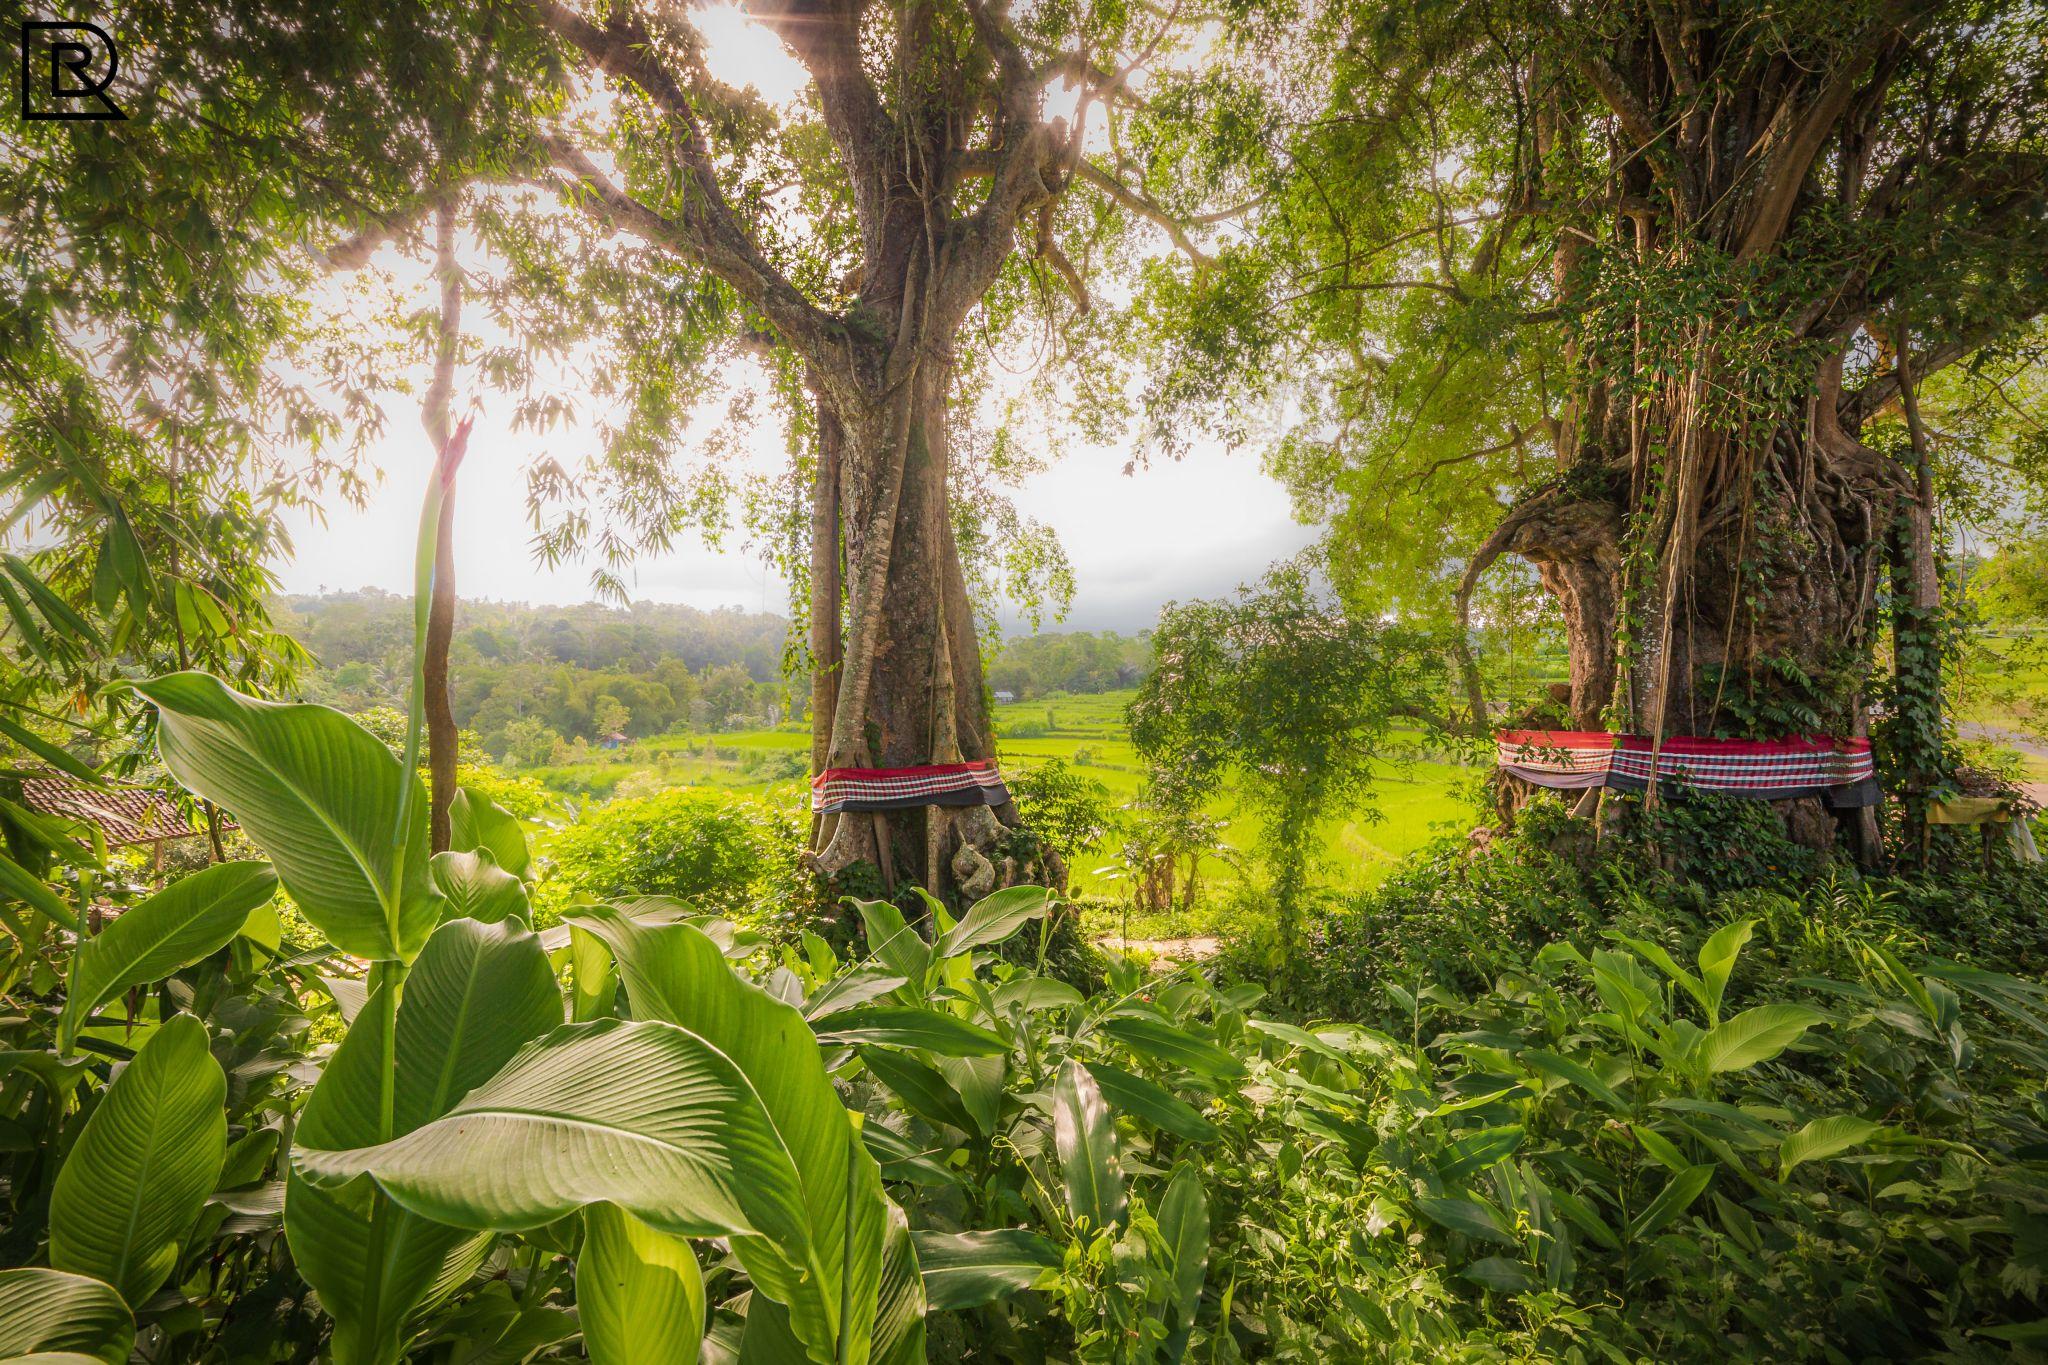 Magic view Tree, Indonesia